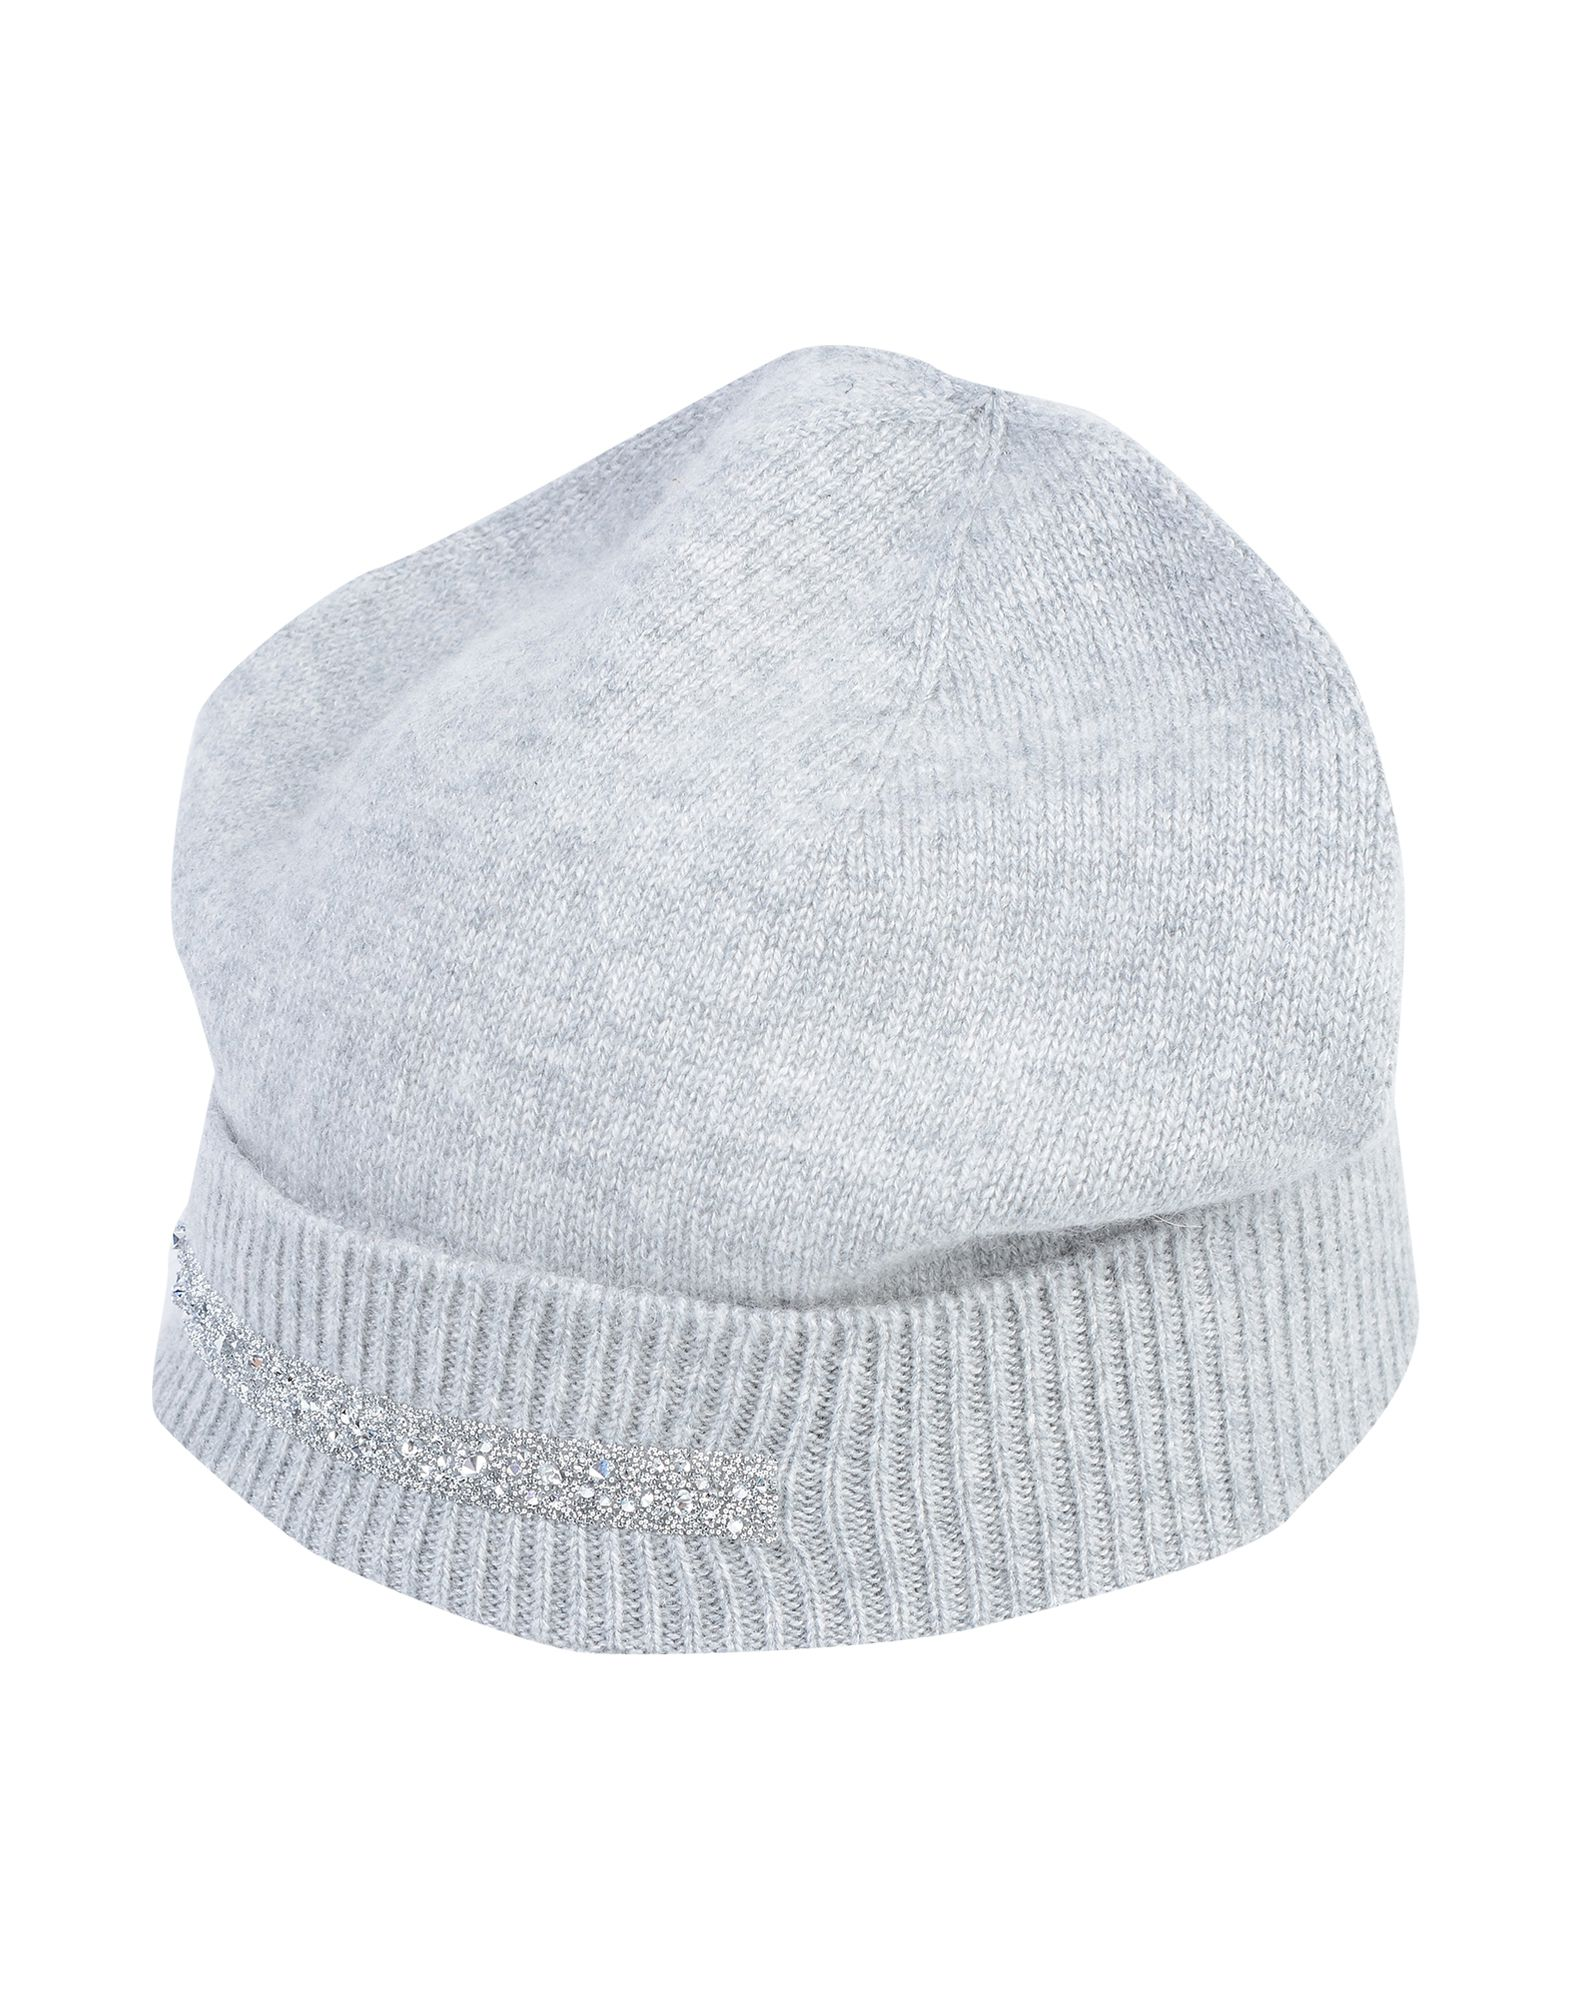 FOTI - LA BIELLESE Головной убор manifatture alto biellese 1947 шарф